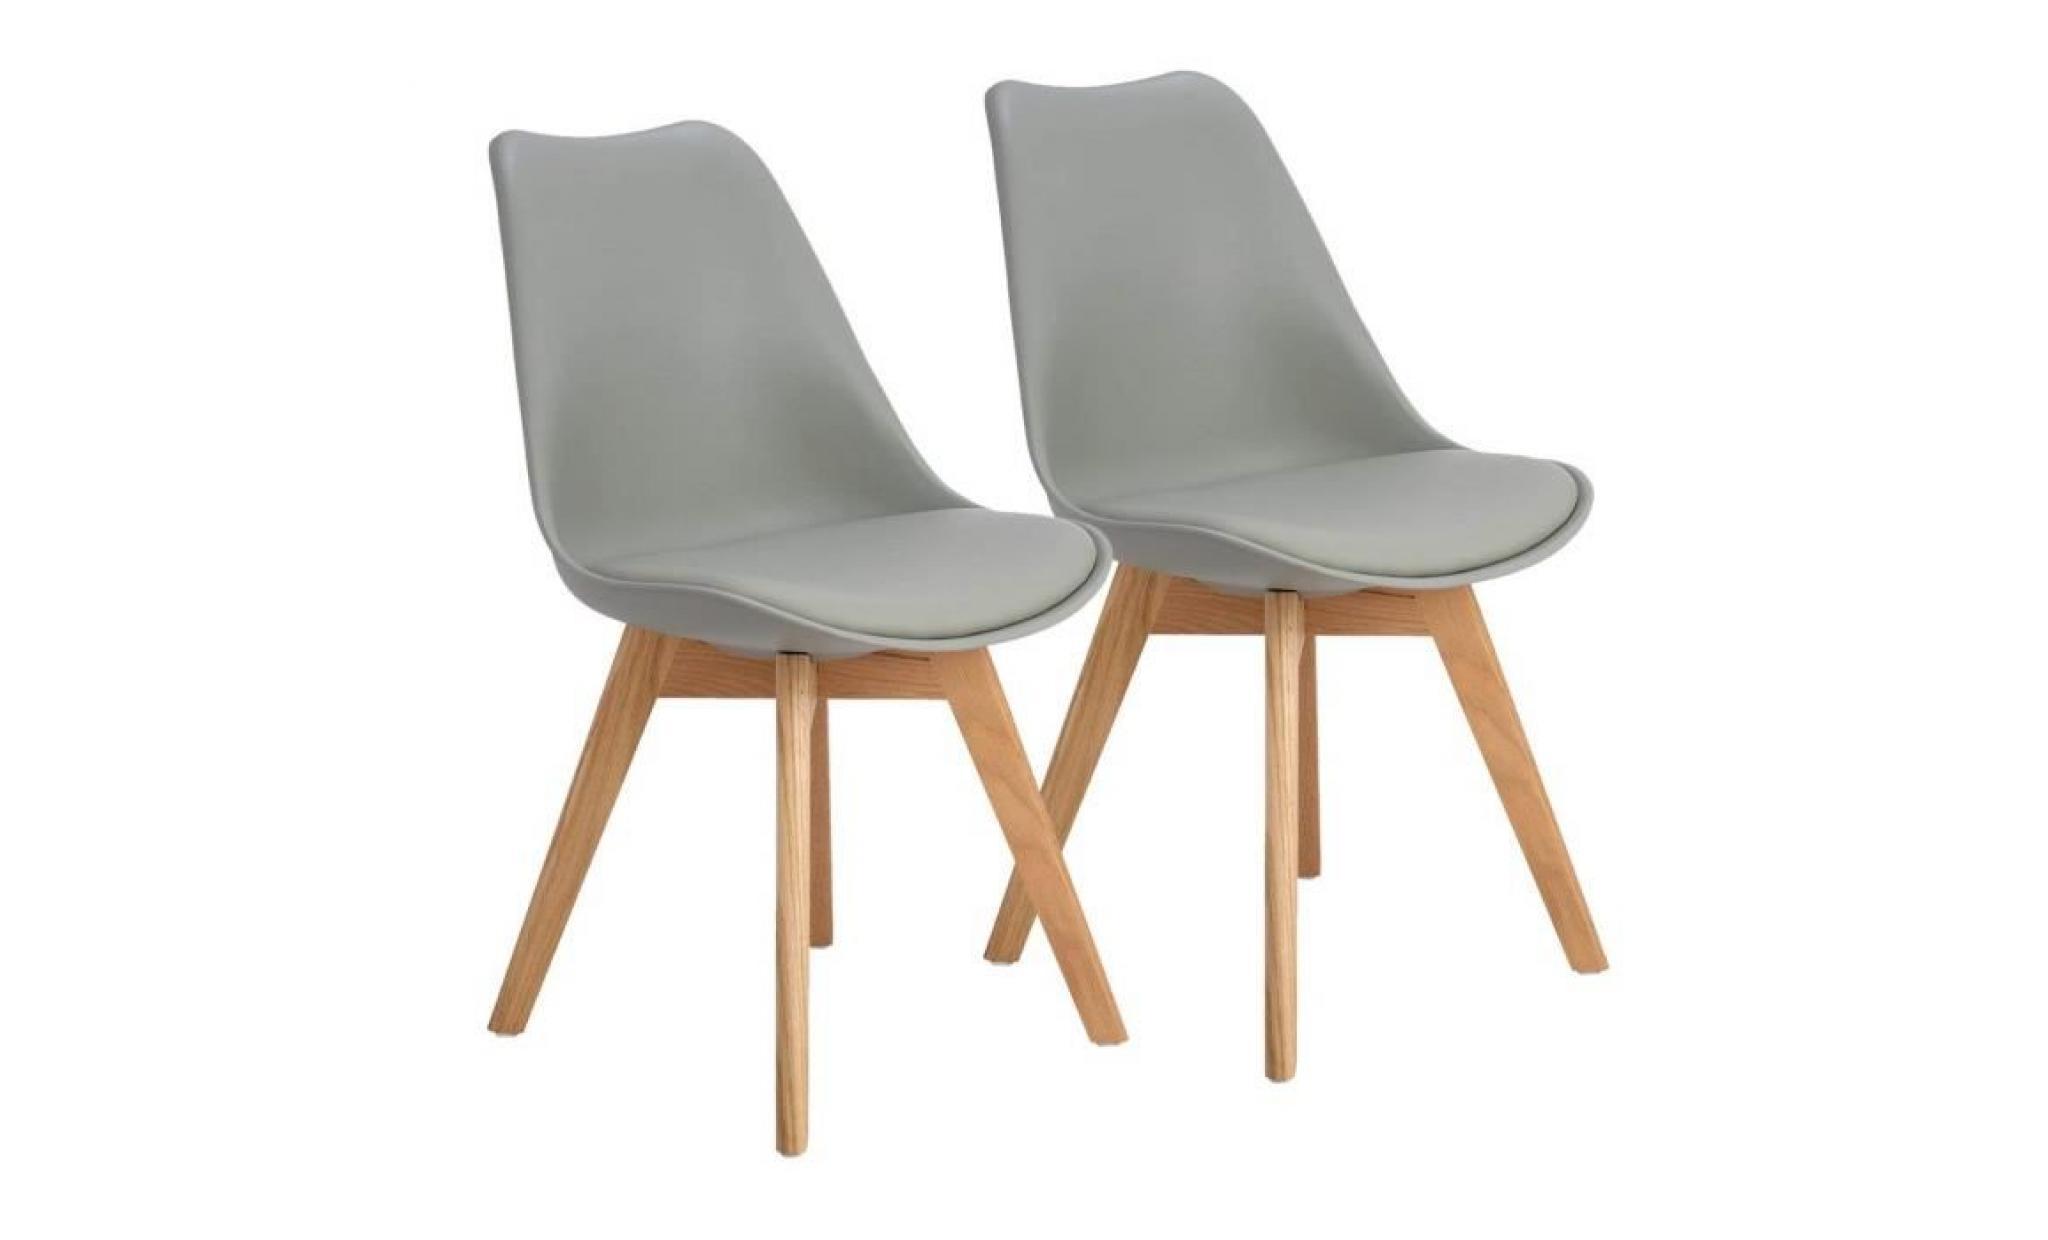 Lot de 2 chaisesde salle à manger scandinaves contemporaines